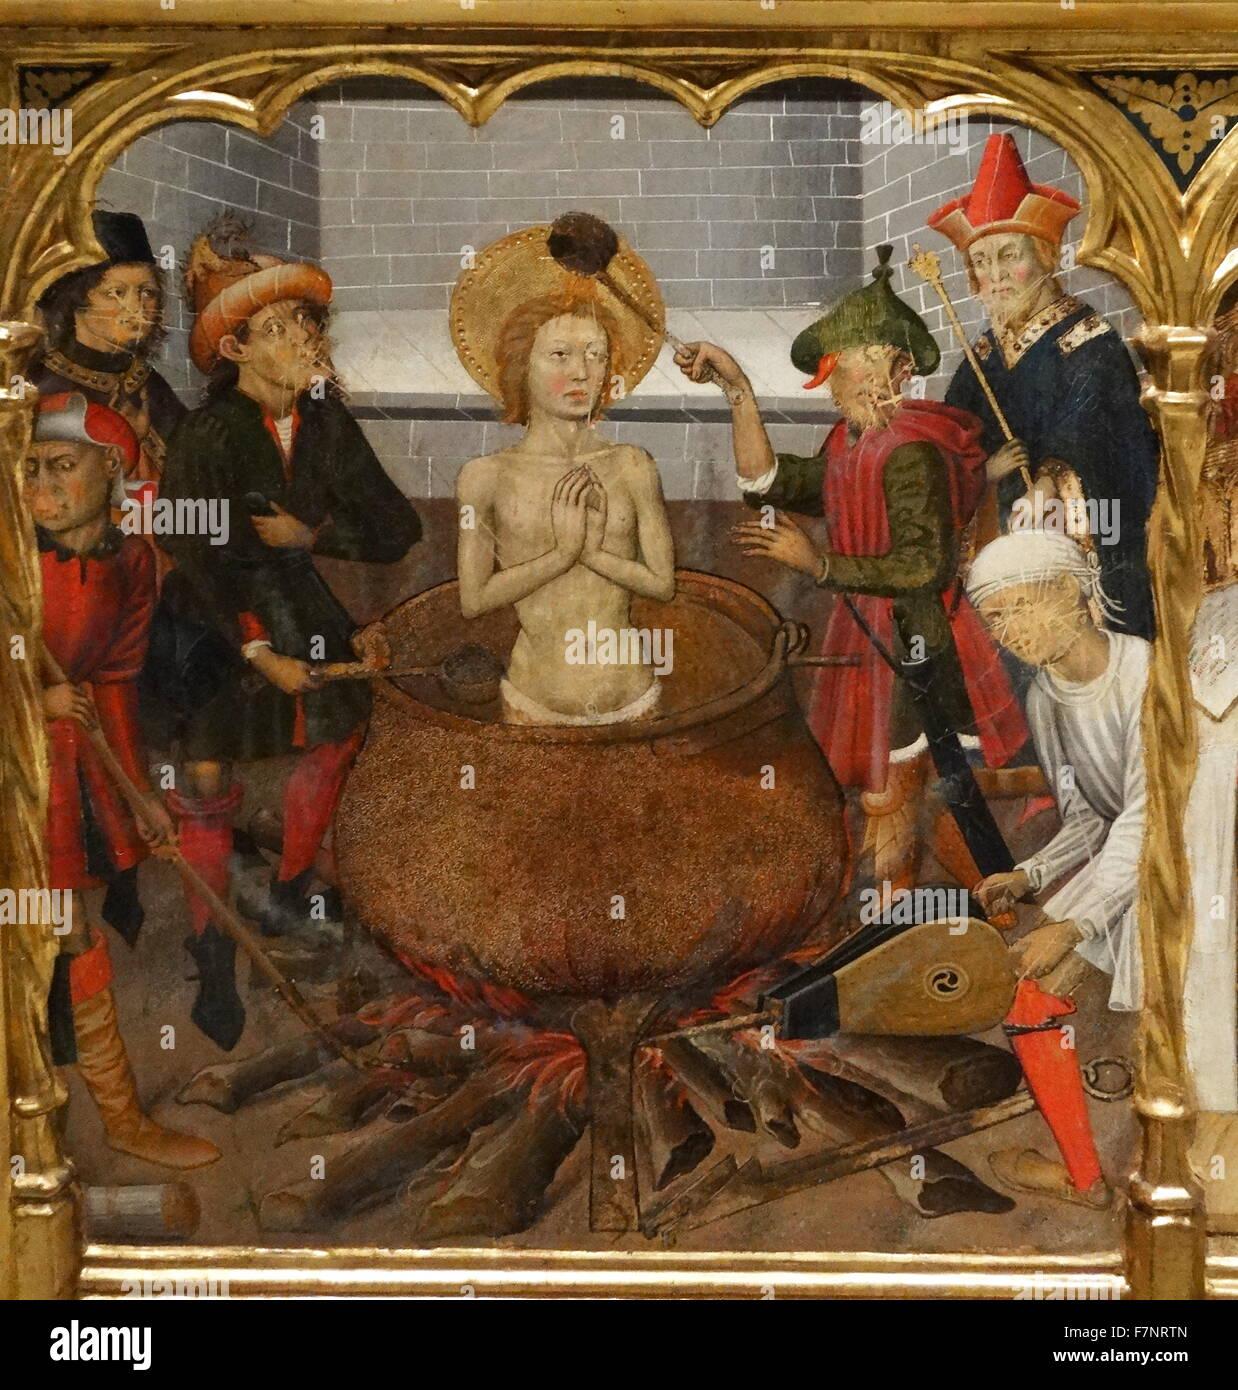 Altarpiece Of Saint John By Bernat Martorell Catalan Painter The International Gothic Style Dated 15th Century